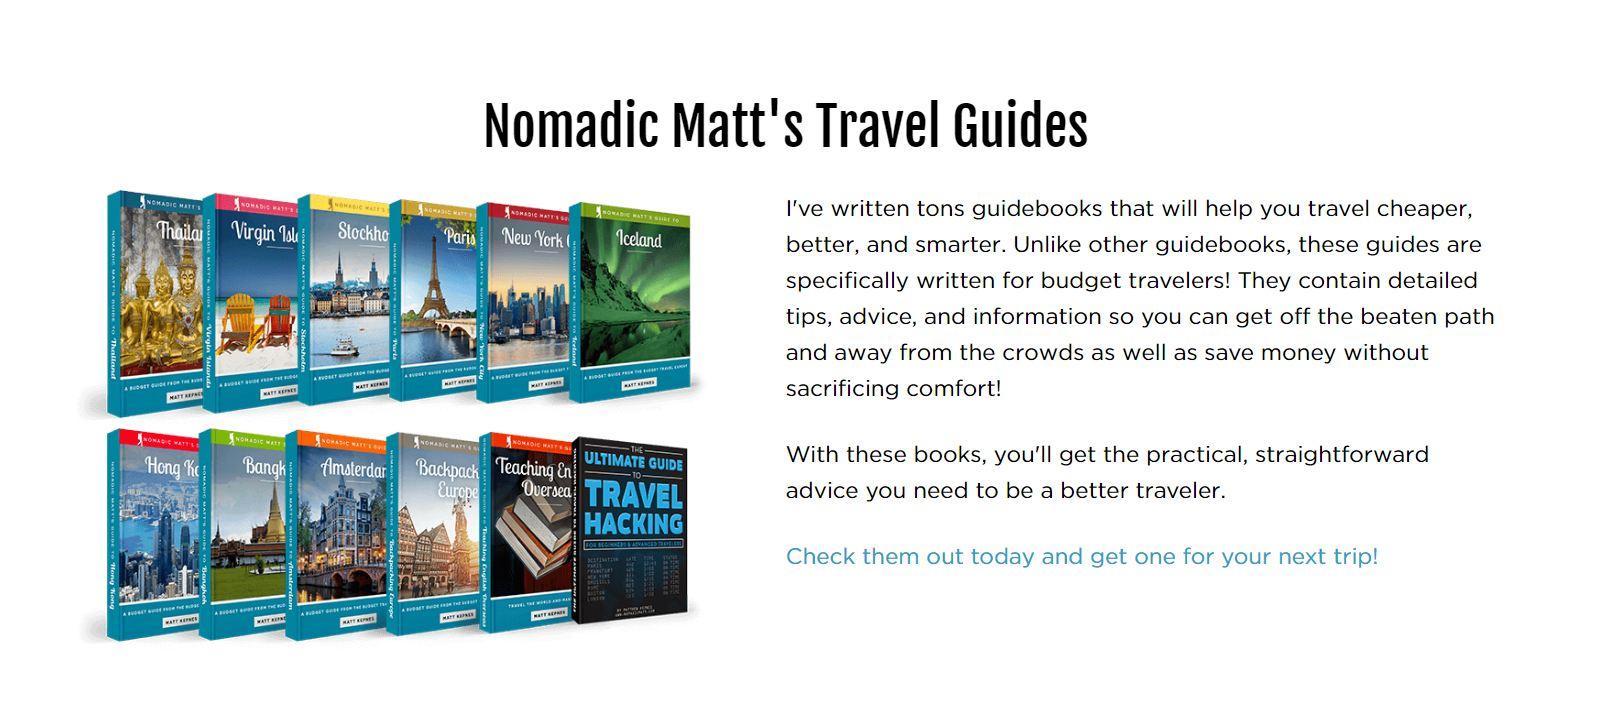 Sản phẩm travel guide của Nomadic Matt